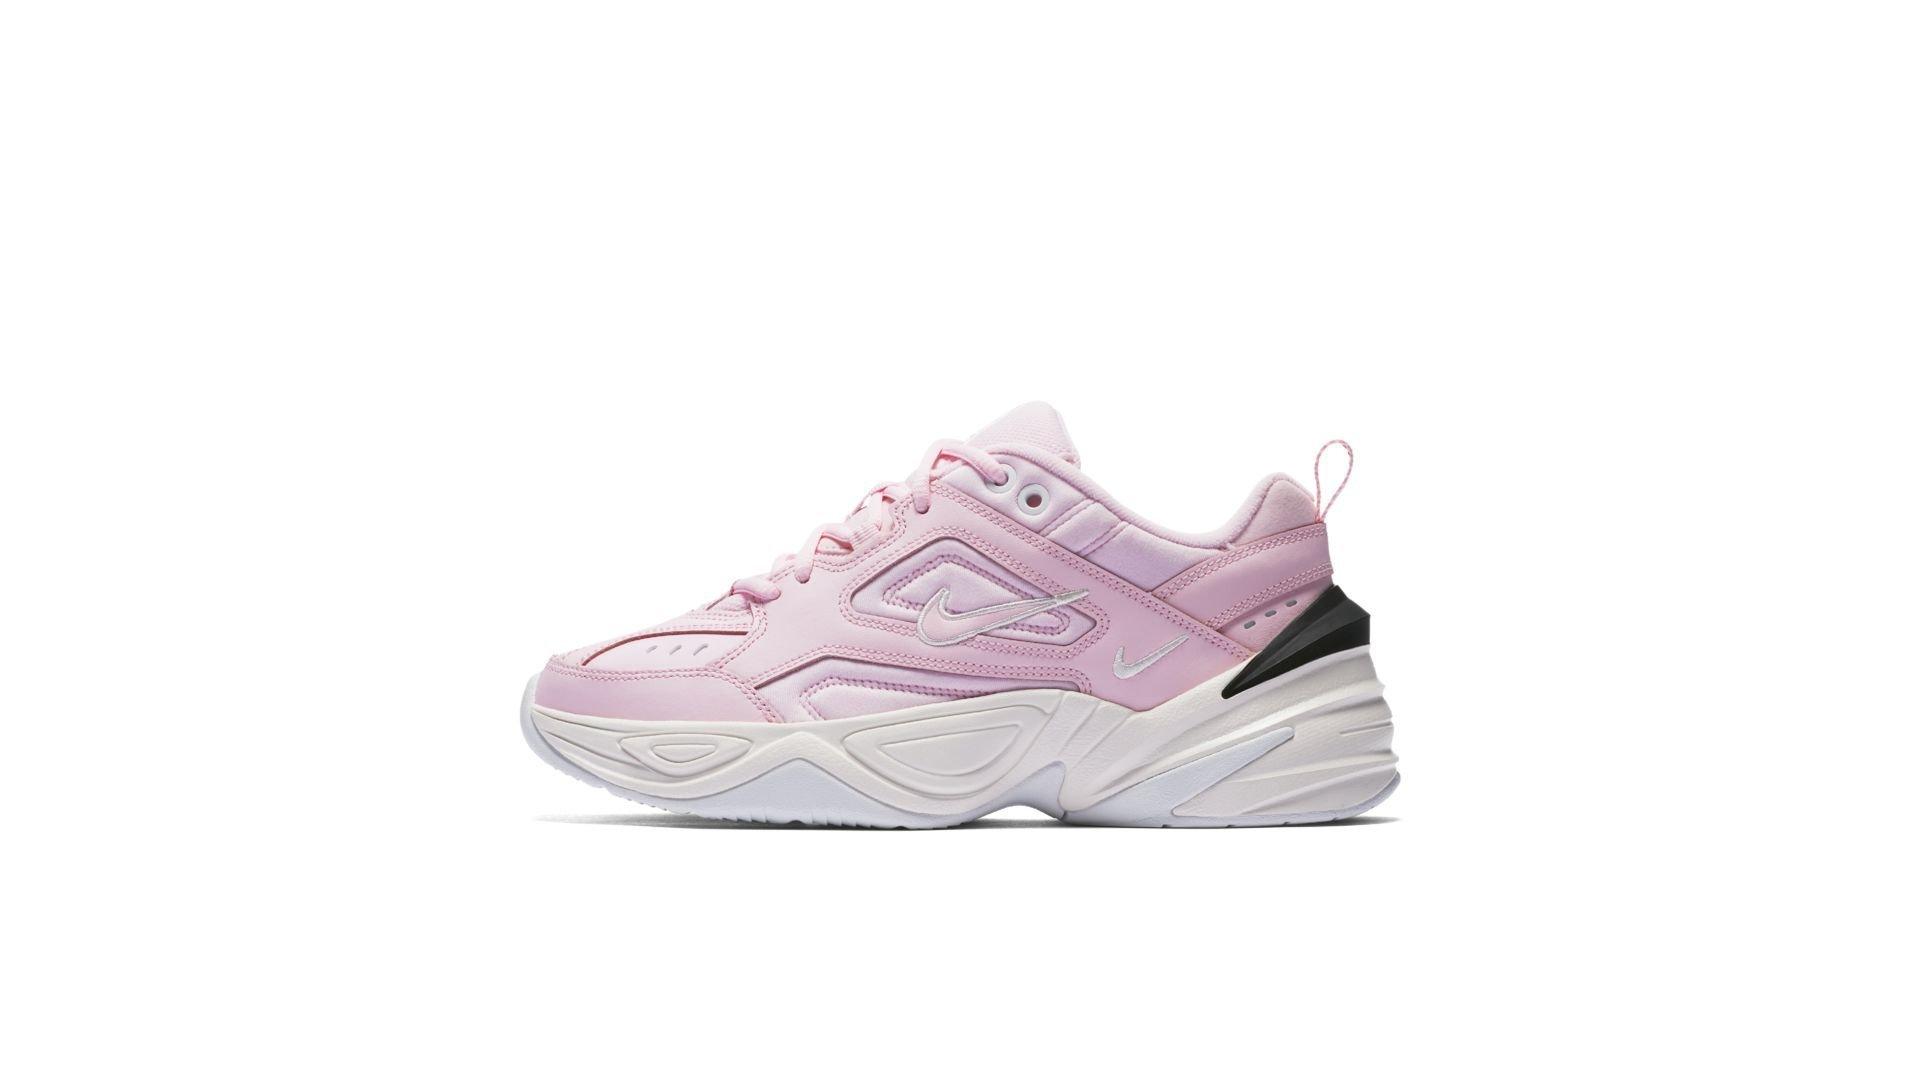 Nike M2K Tekno 'Pink' (AO3108-600)